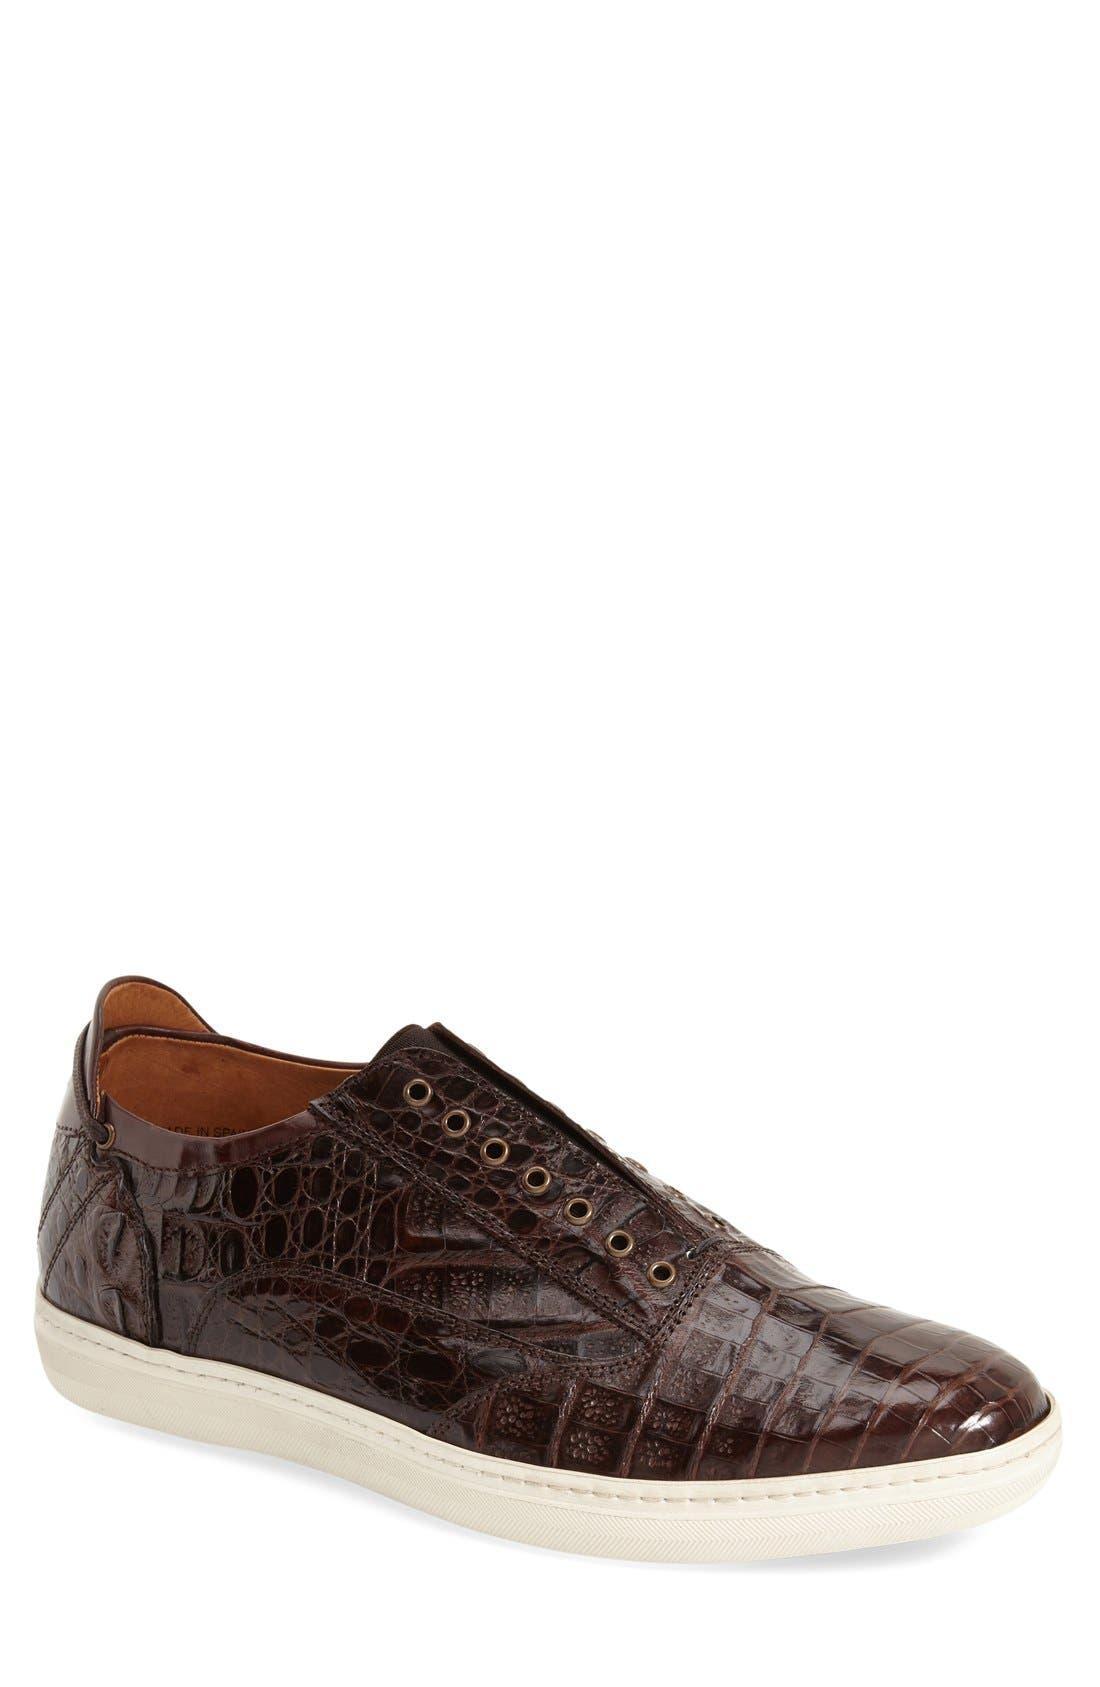 'Emmanuel' Slip-on Sneaker,                             Main thumbnail 2, color,